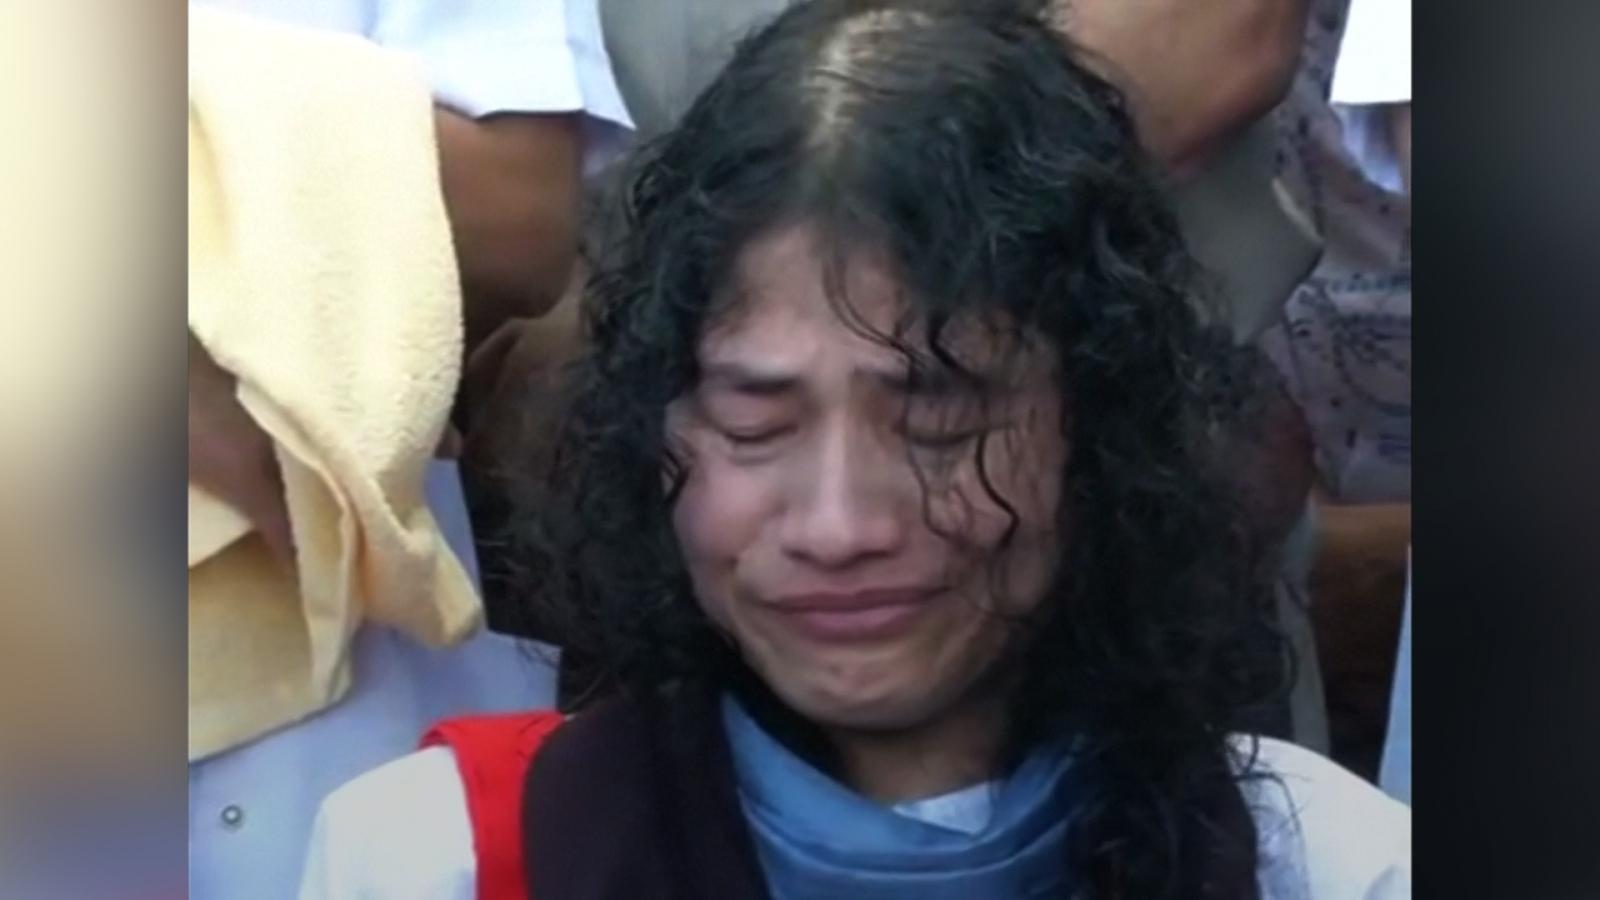 Human rights activist ends hunger strike